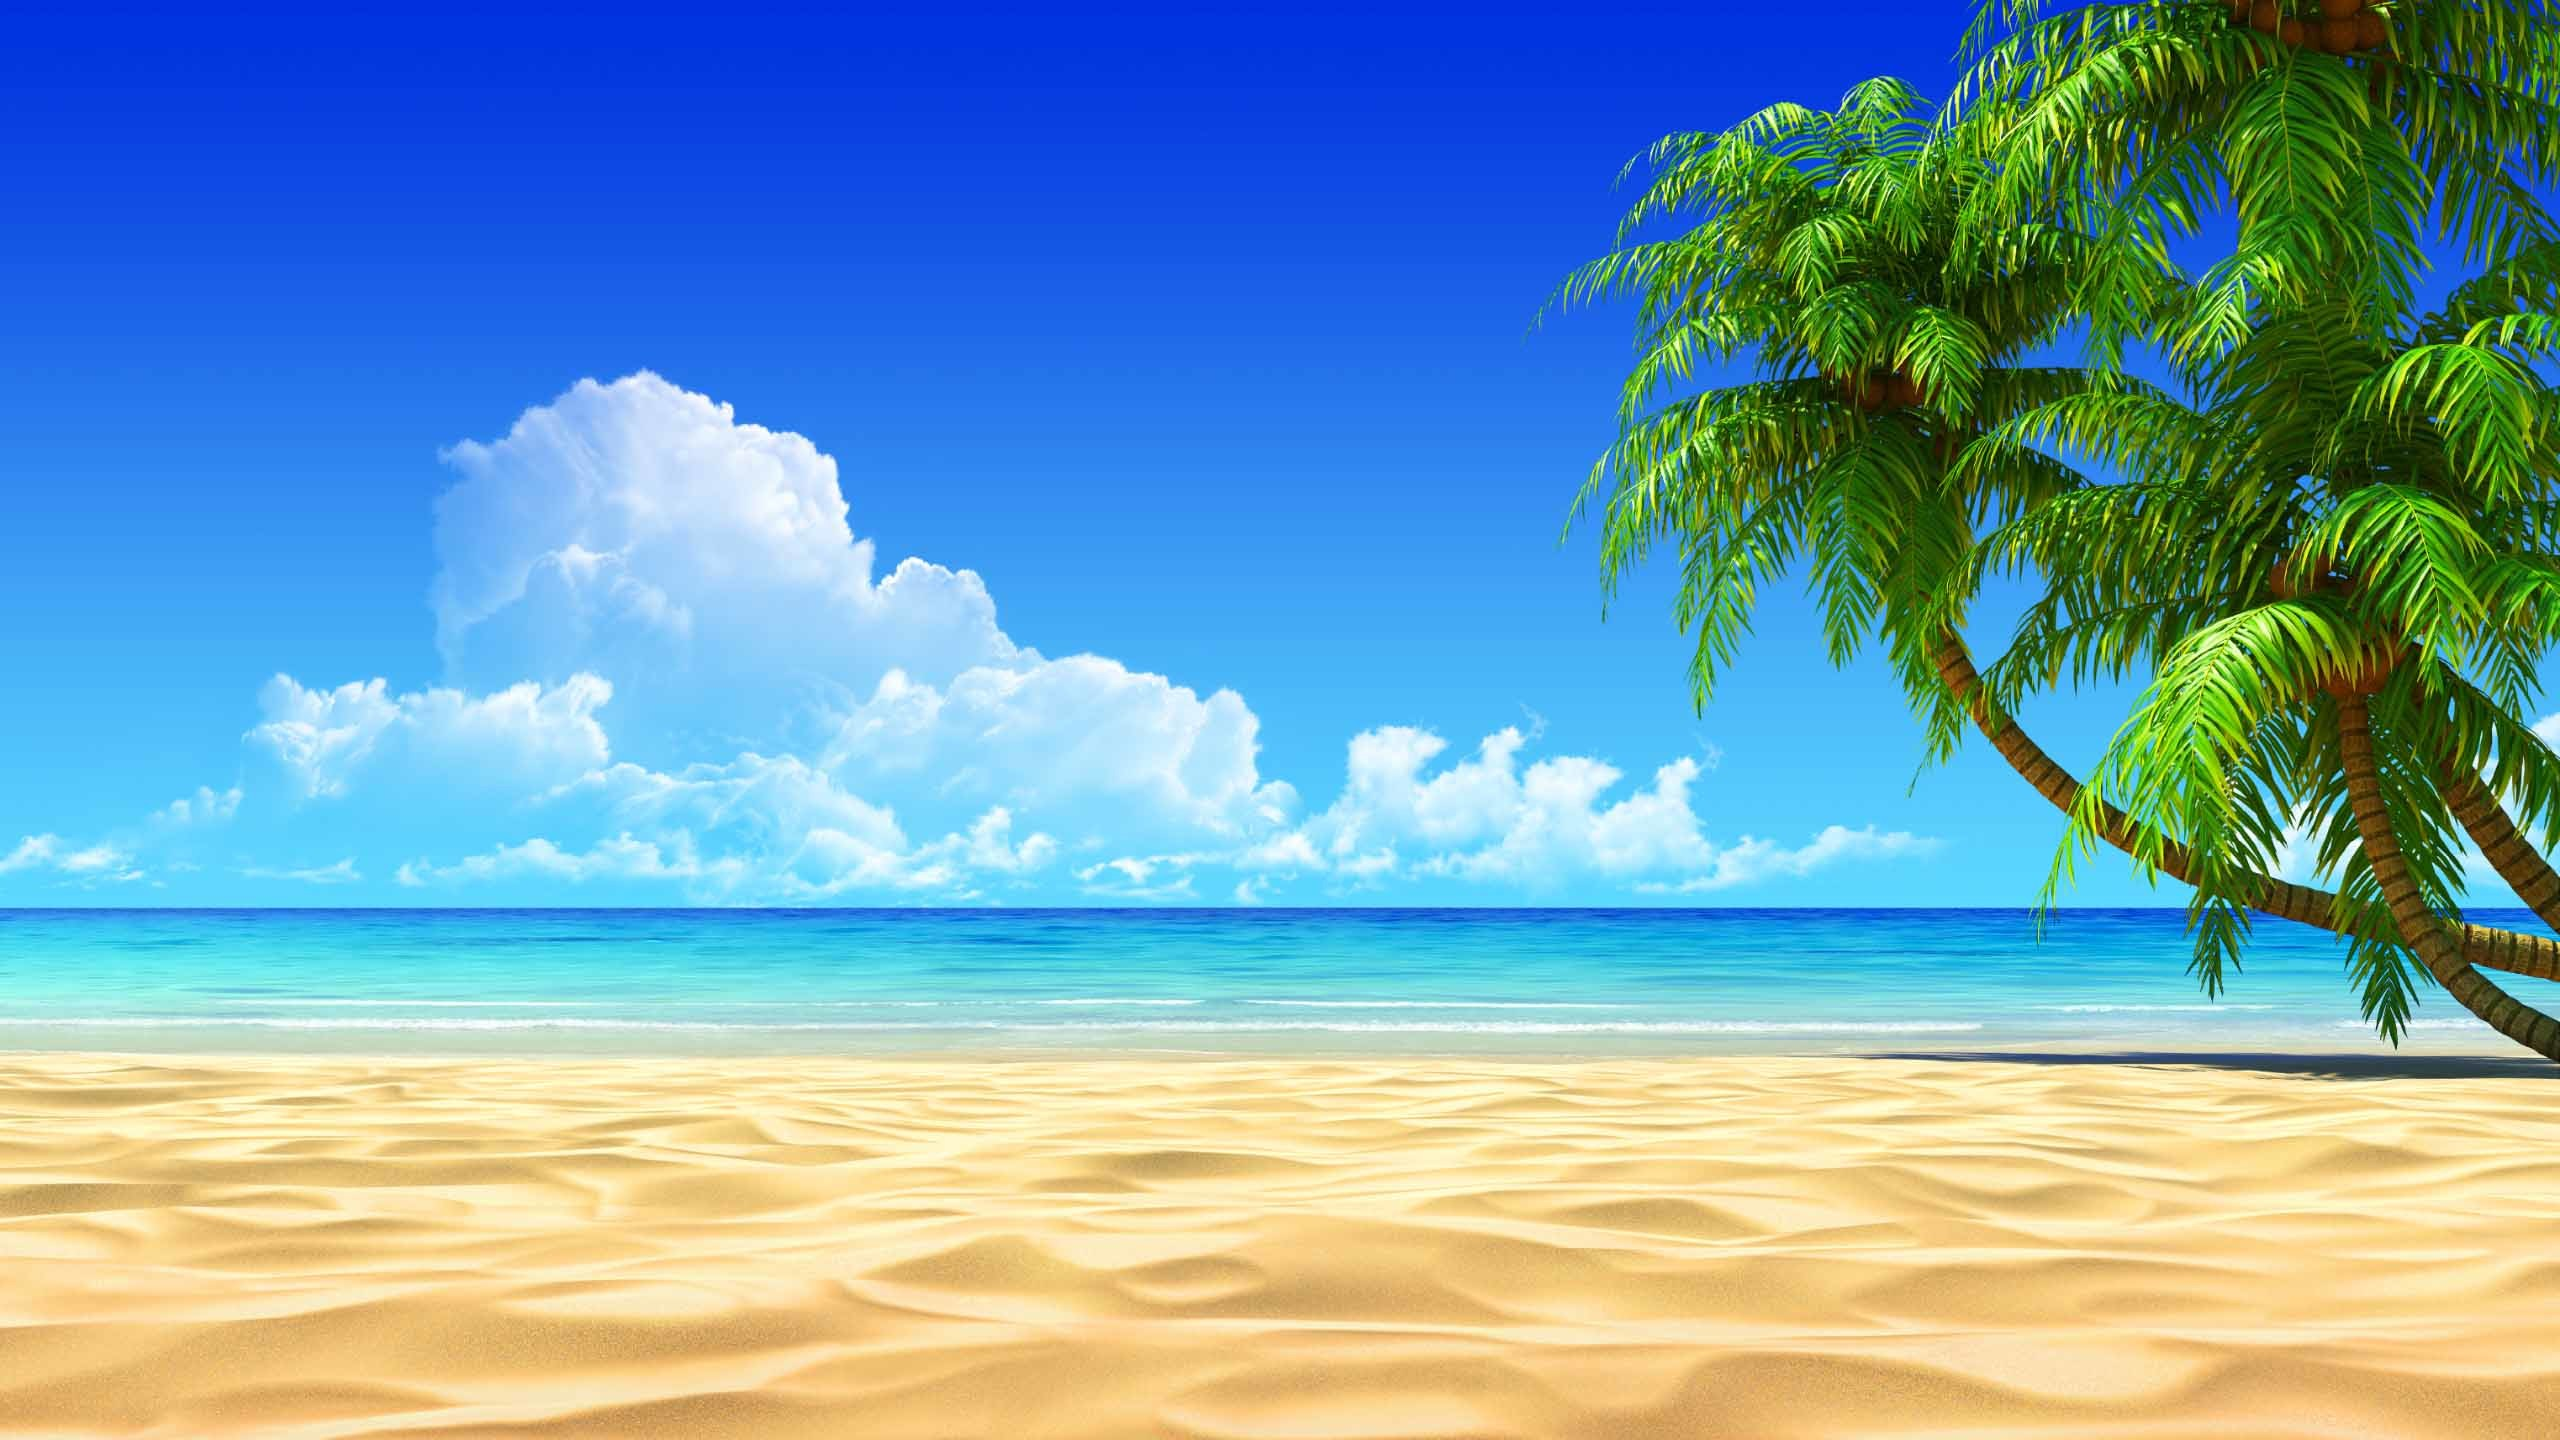 tropical beach hd wallpaper 68 images